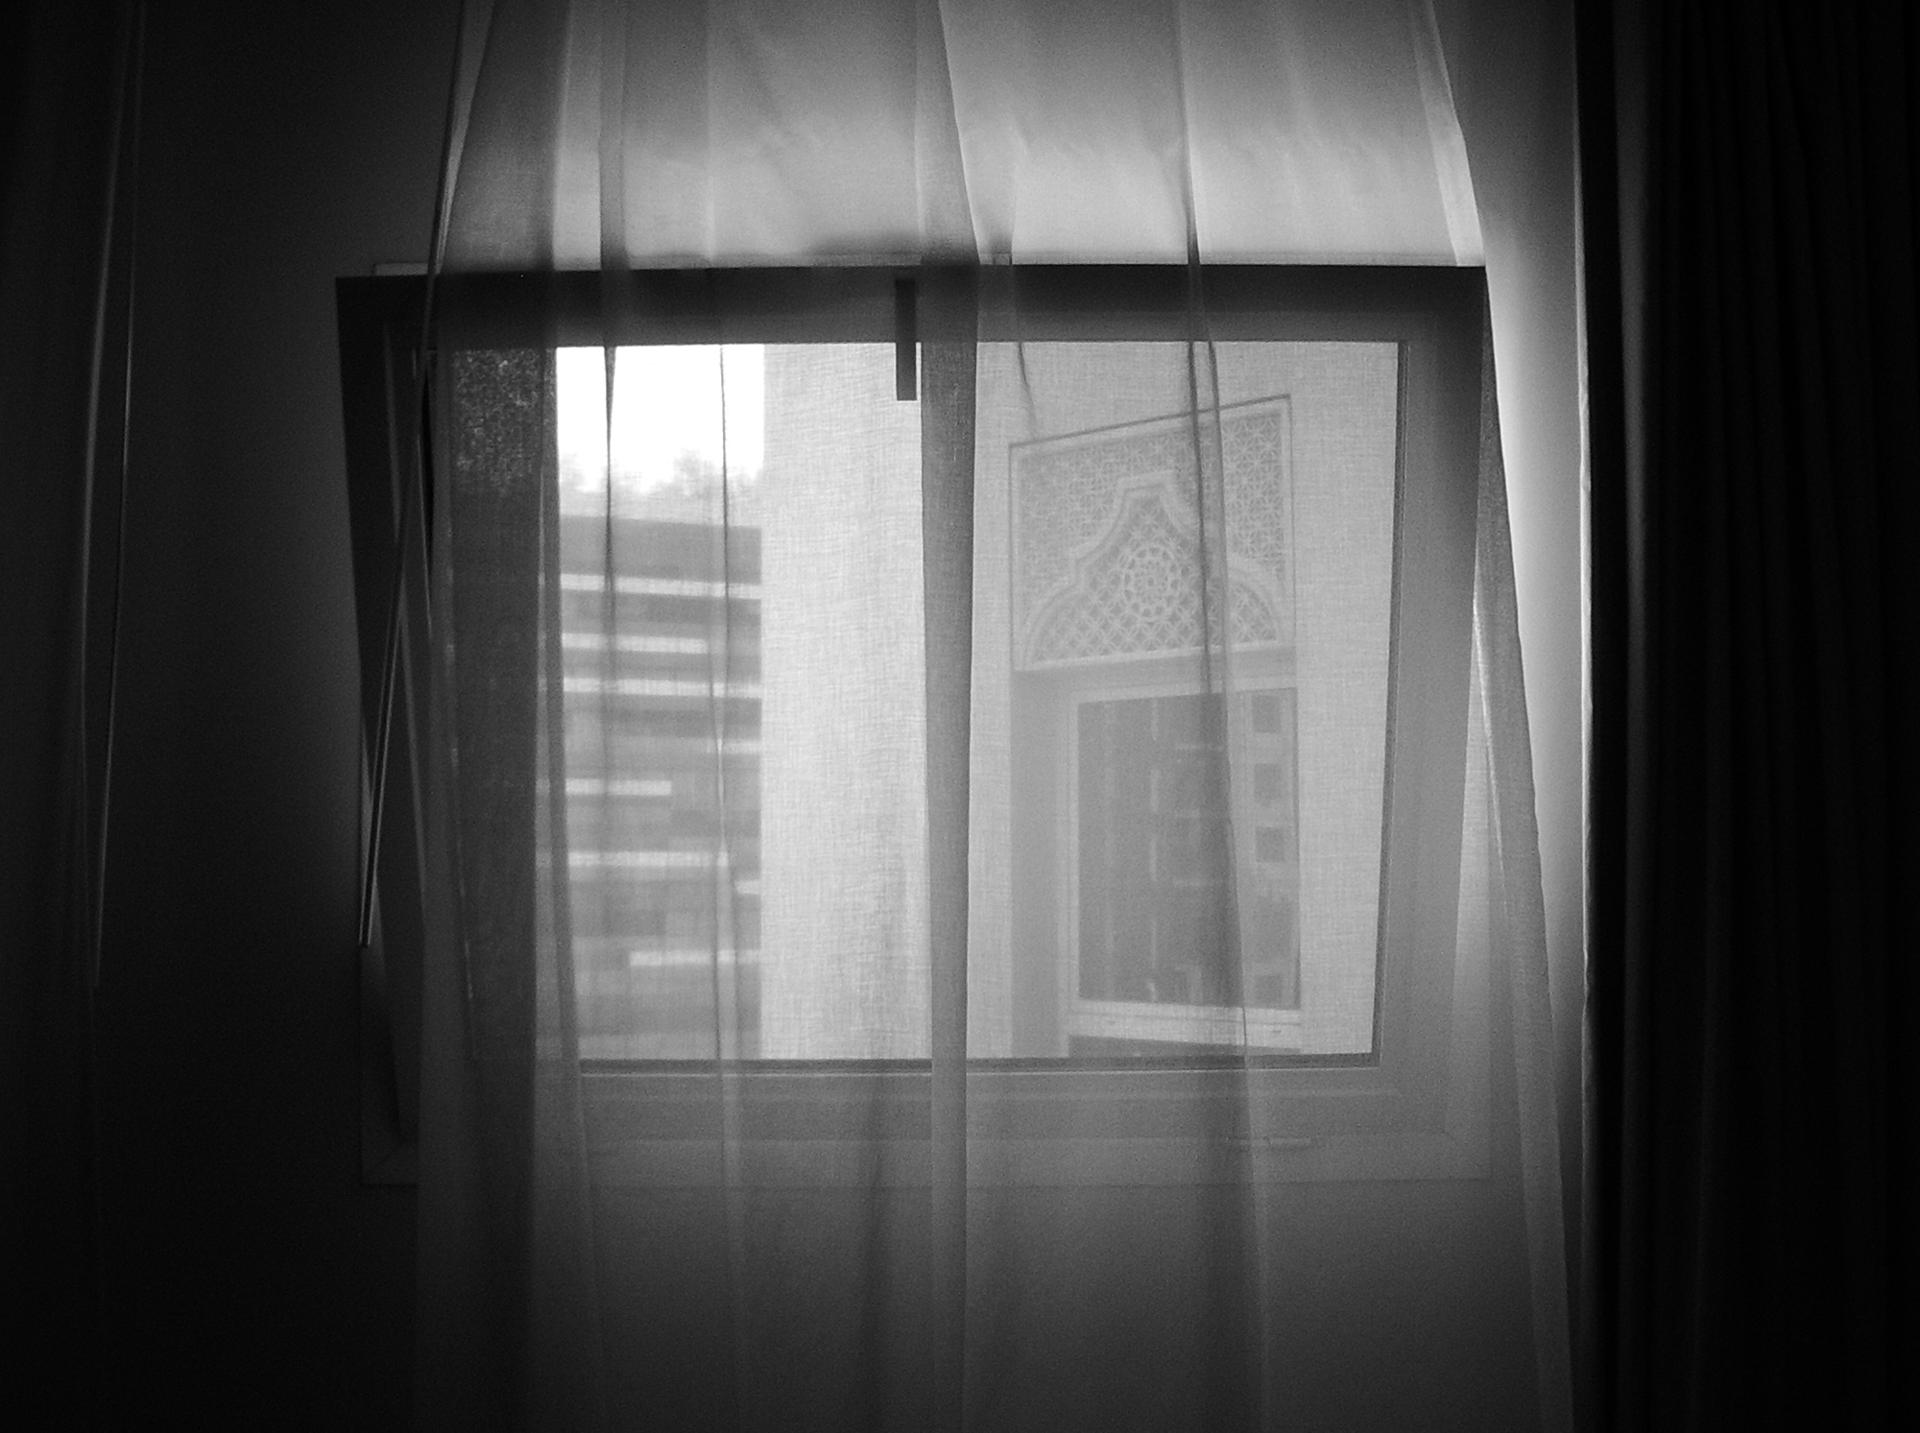 Hotel life - From my window - Doha